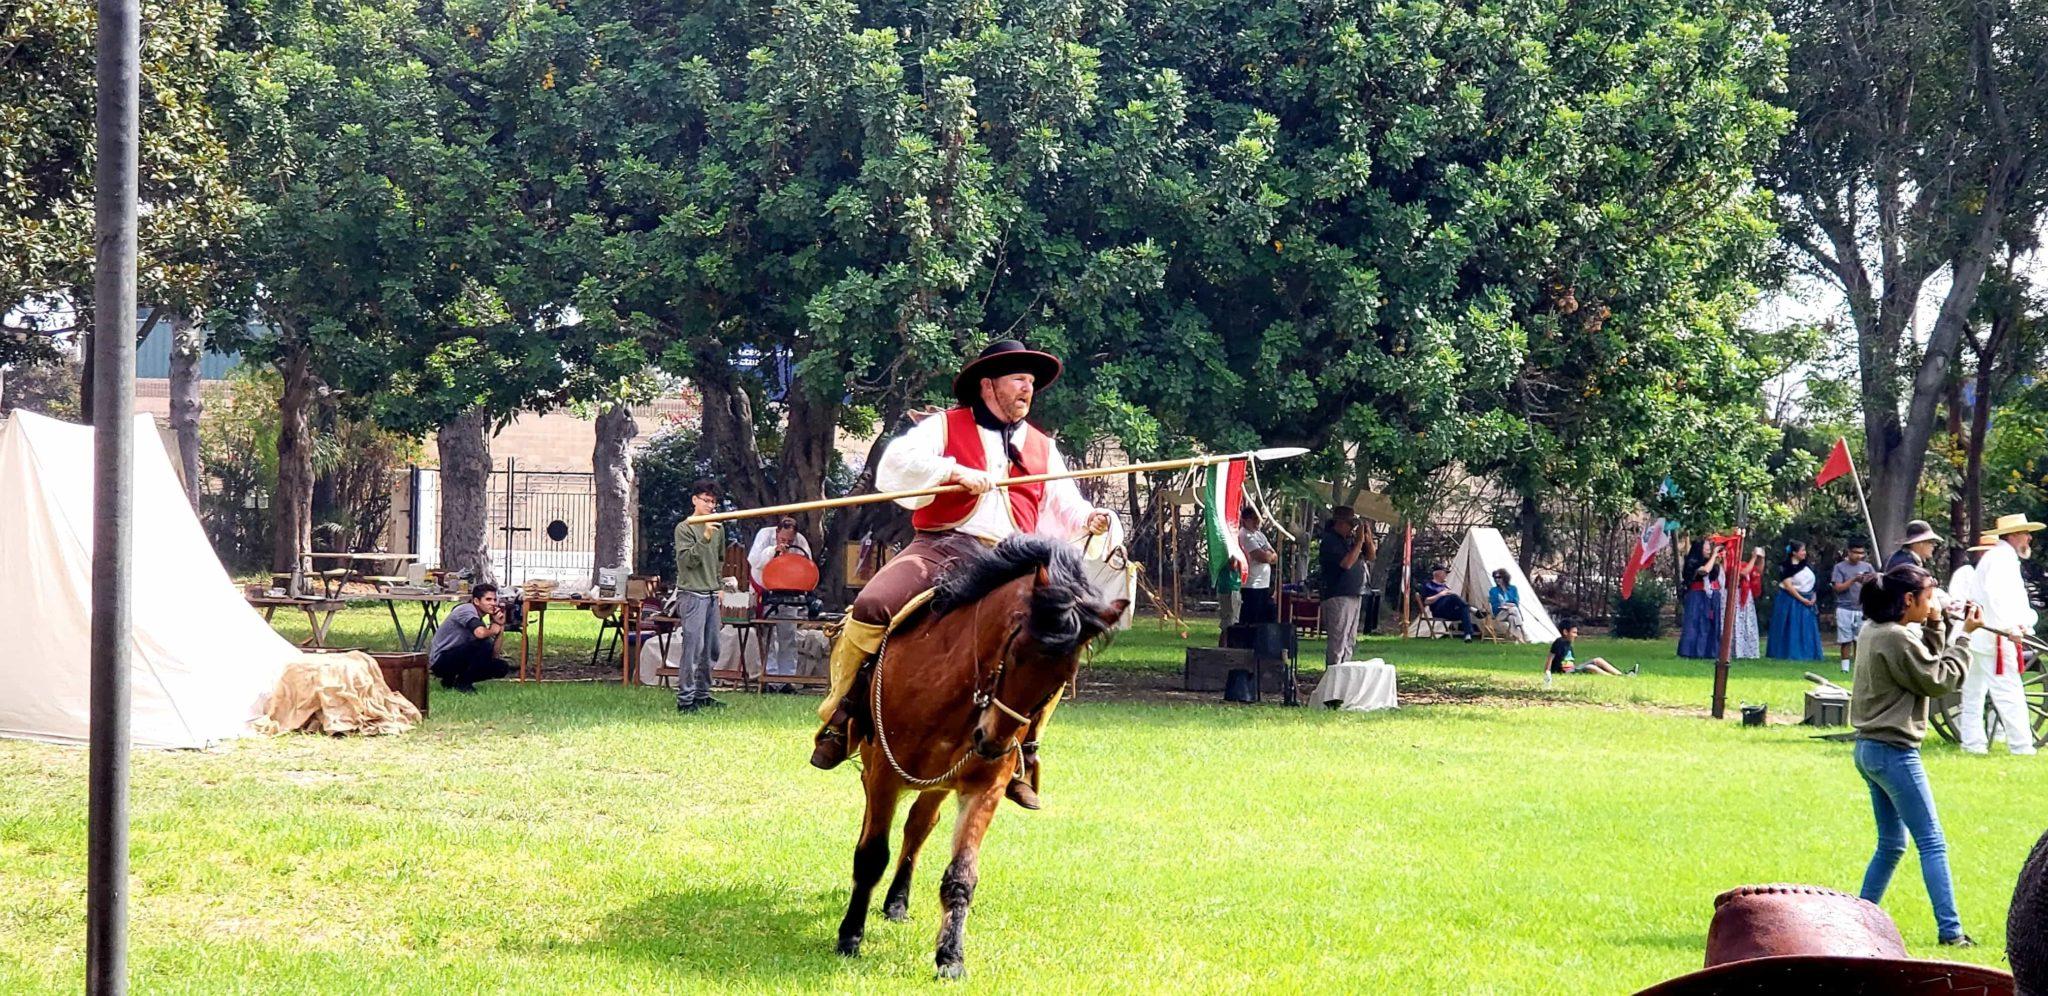 Dominguez Rancho Adobe Museum's 173rd Anniversary of the Battle of Dominguez Hill Battle Re-enactment